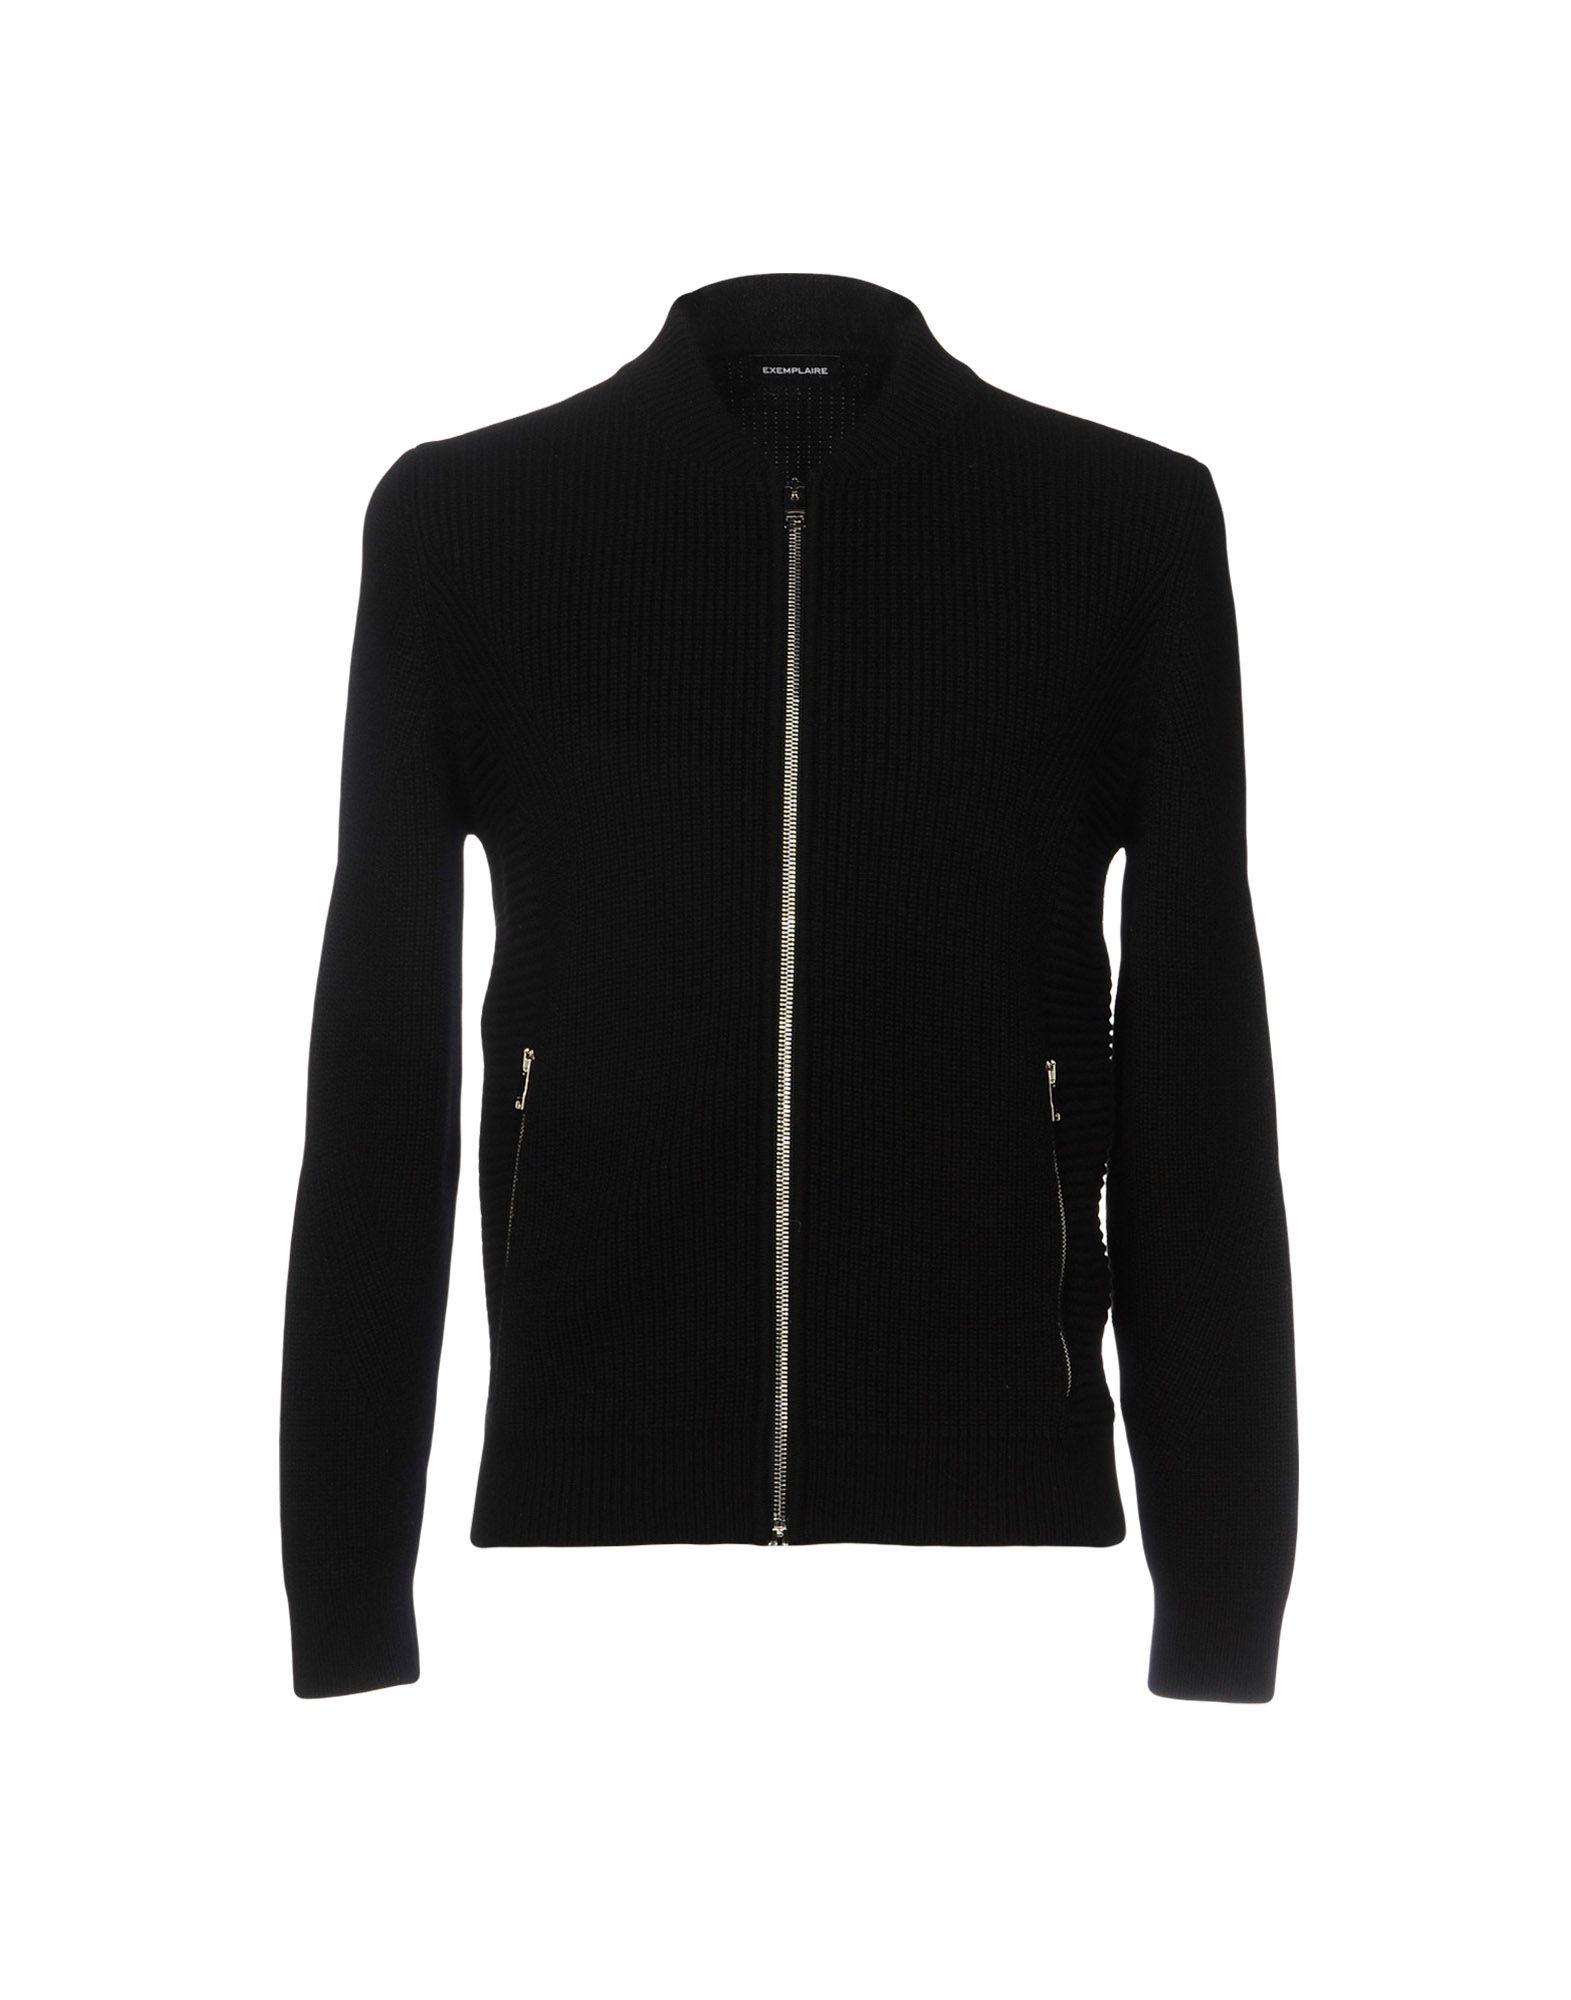 EXEMPLAIRE Cardigan in Black